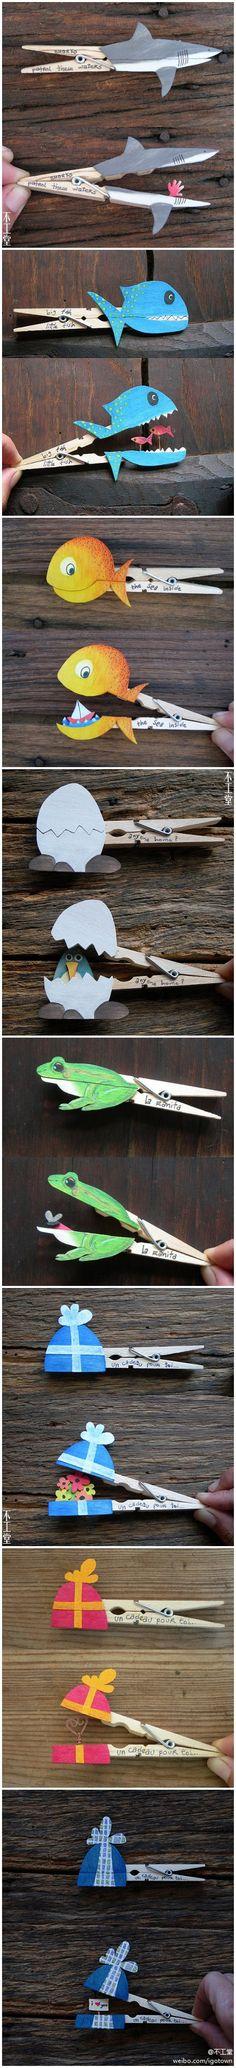 Fun wooden peg craft.